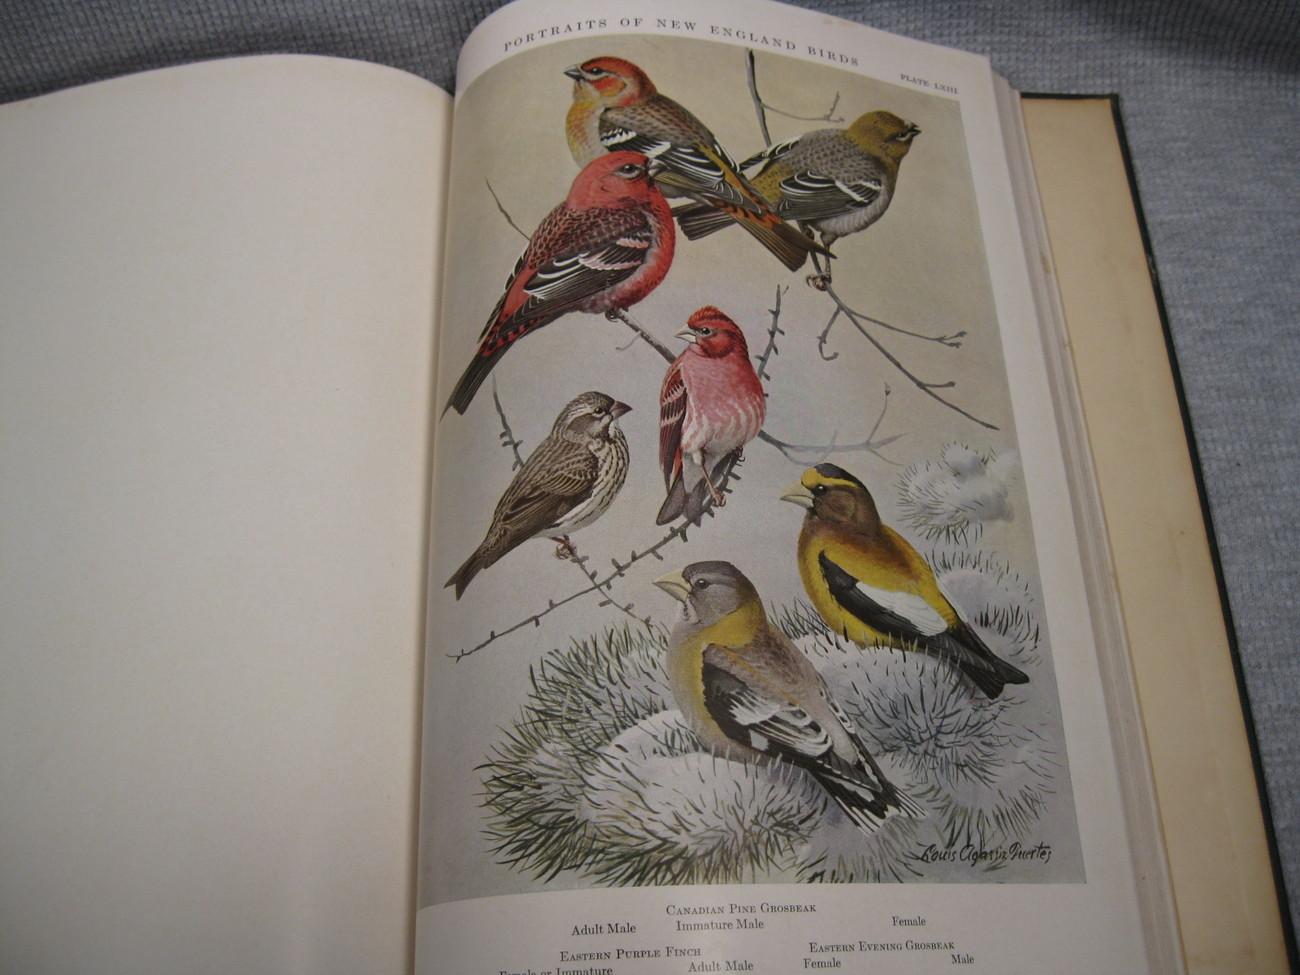 Portraits of New England Birds for Edward Howe Forbush 1932 Fuertes Brooks